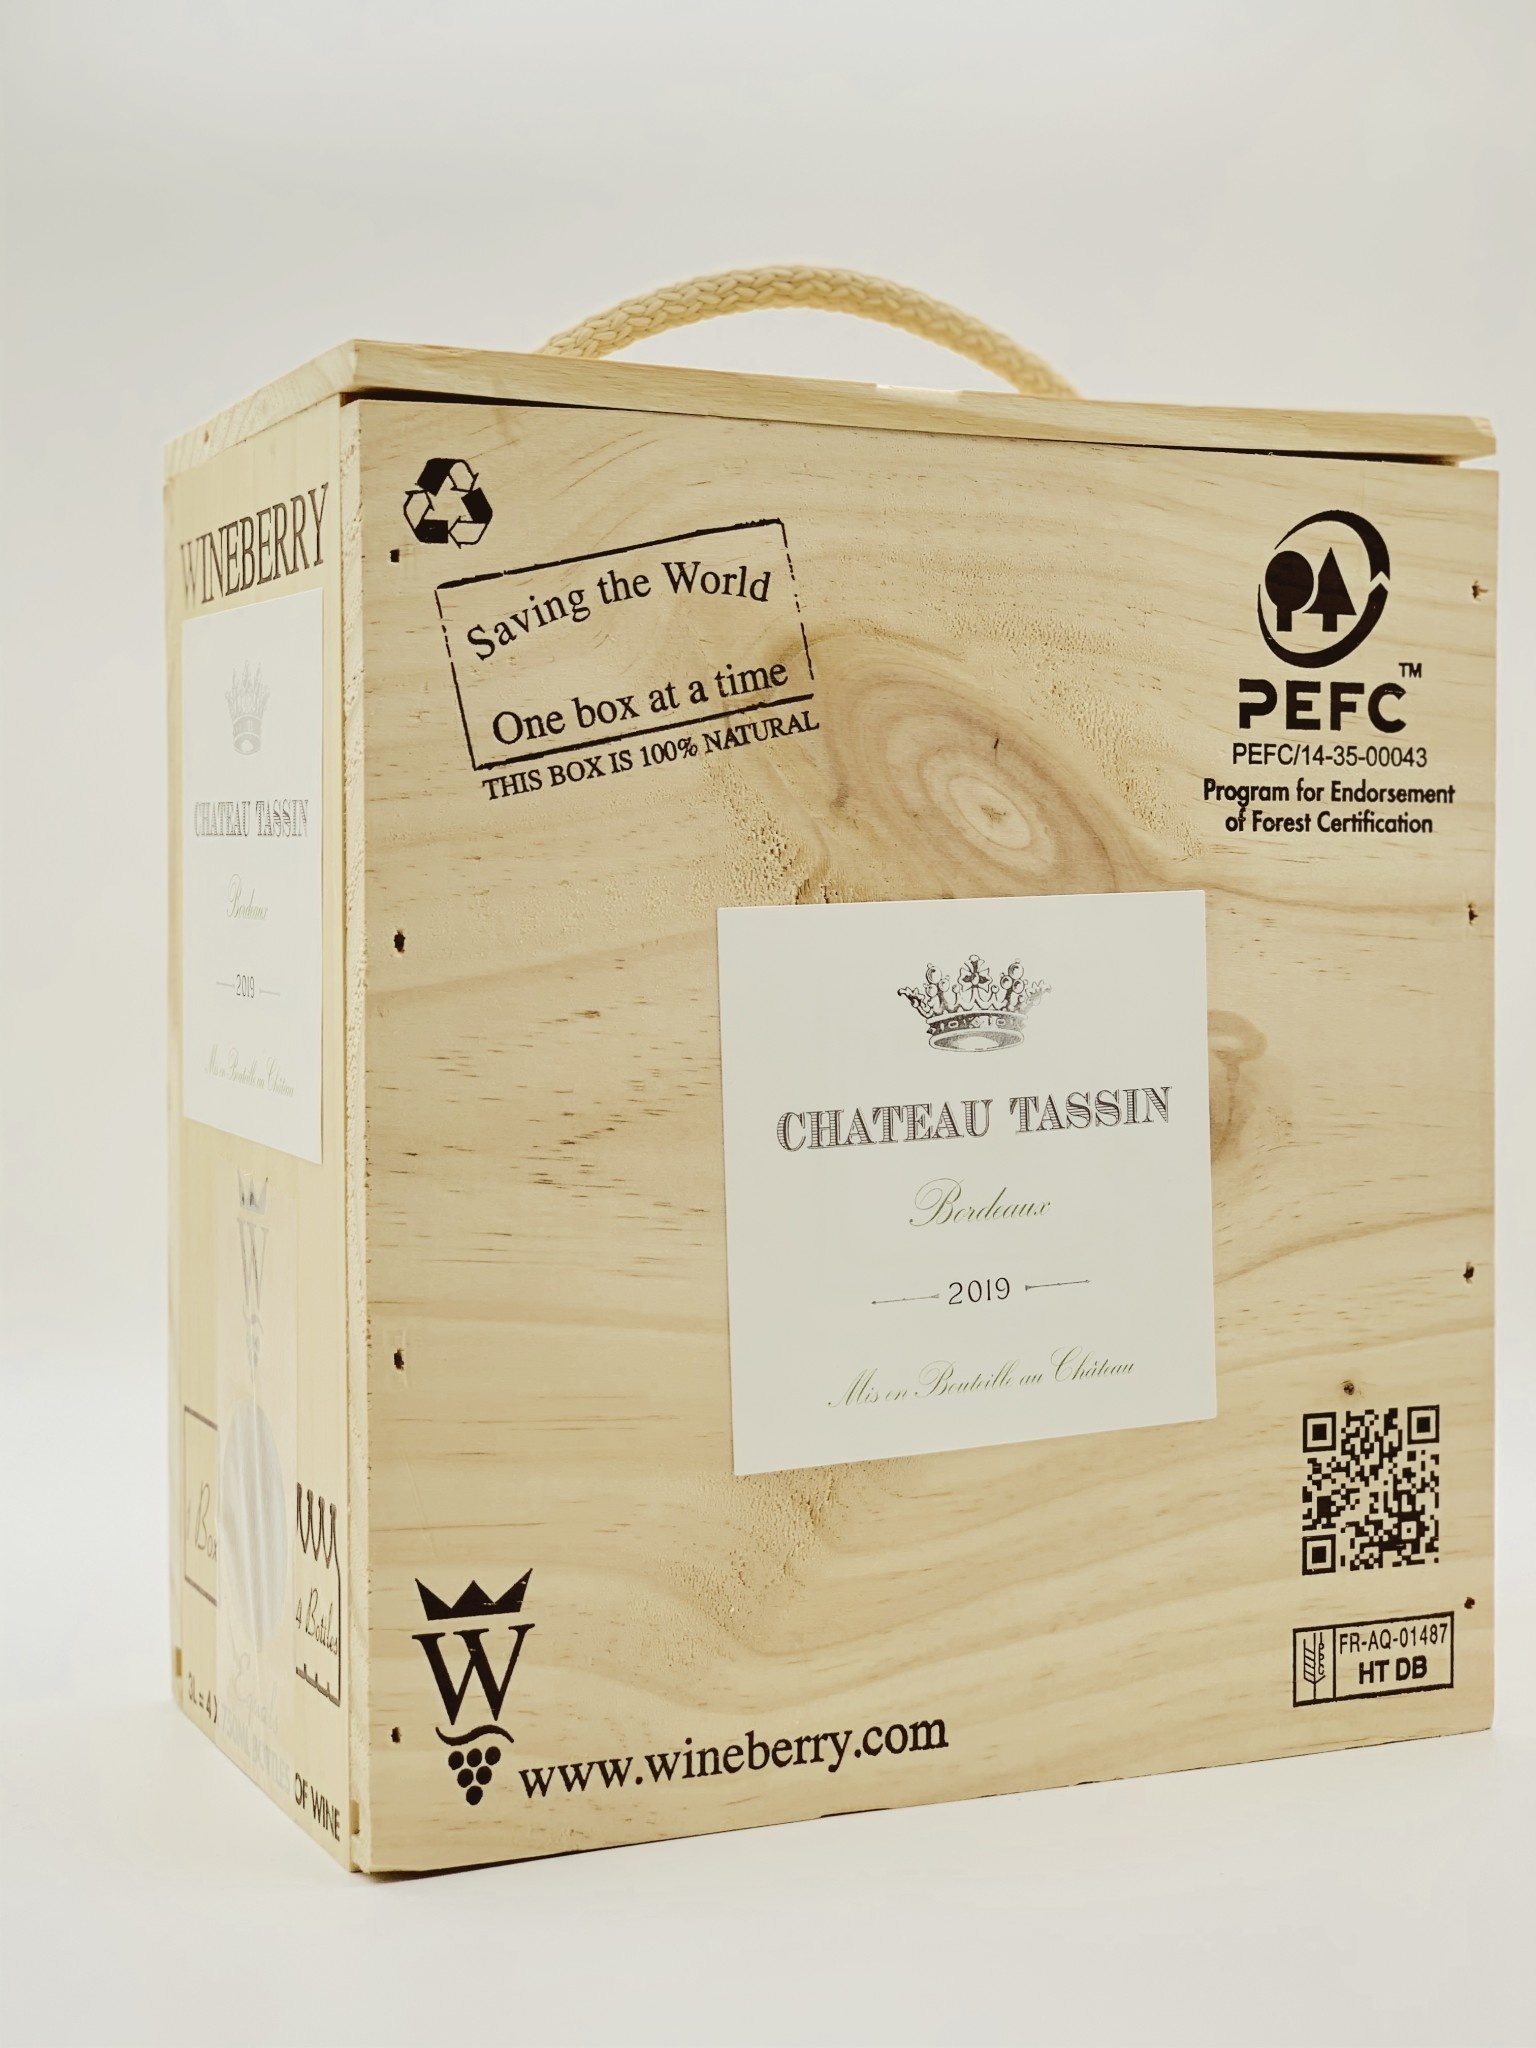 Bordeaux Blanc 3.0 Liter Box Wine 2018/19 Chateau Tassin